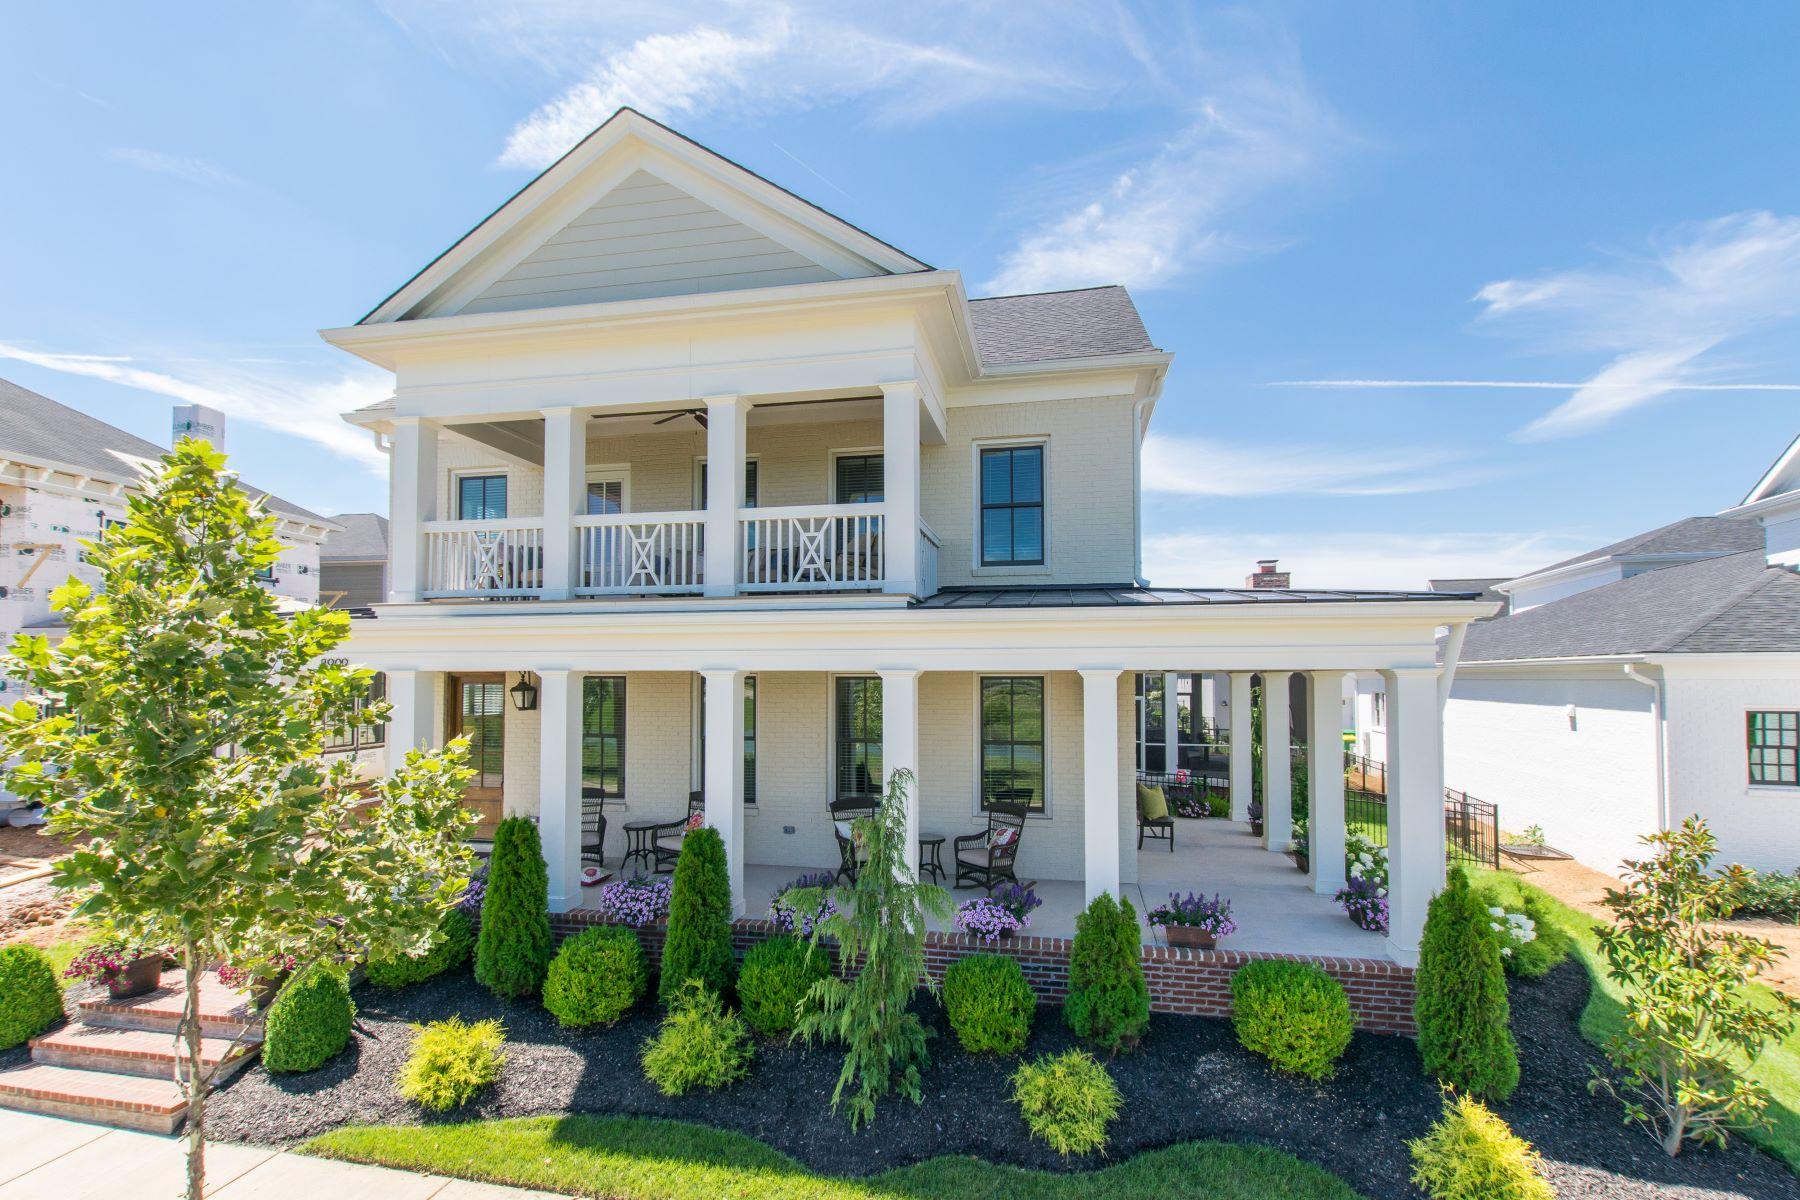 Single Family Home for Sale at 8909 Bergamot Drive 8909 Bergamot Drive Prospect, Kentucky 40059 United States